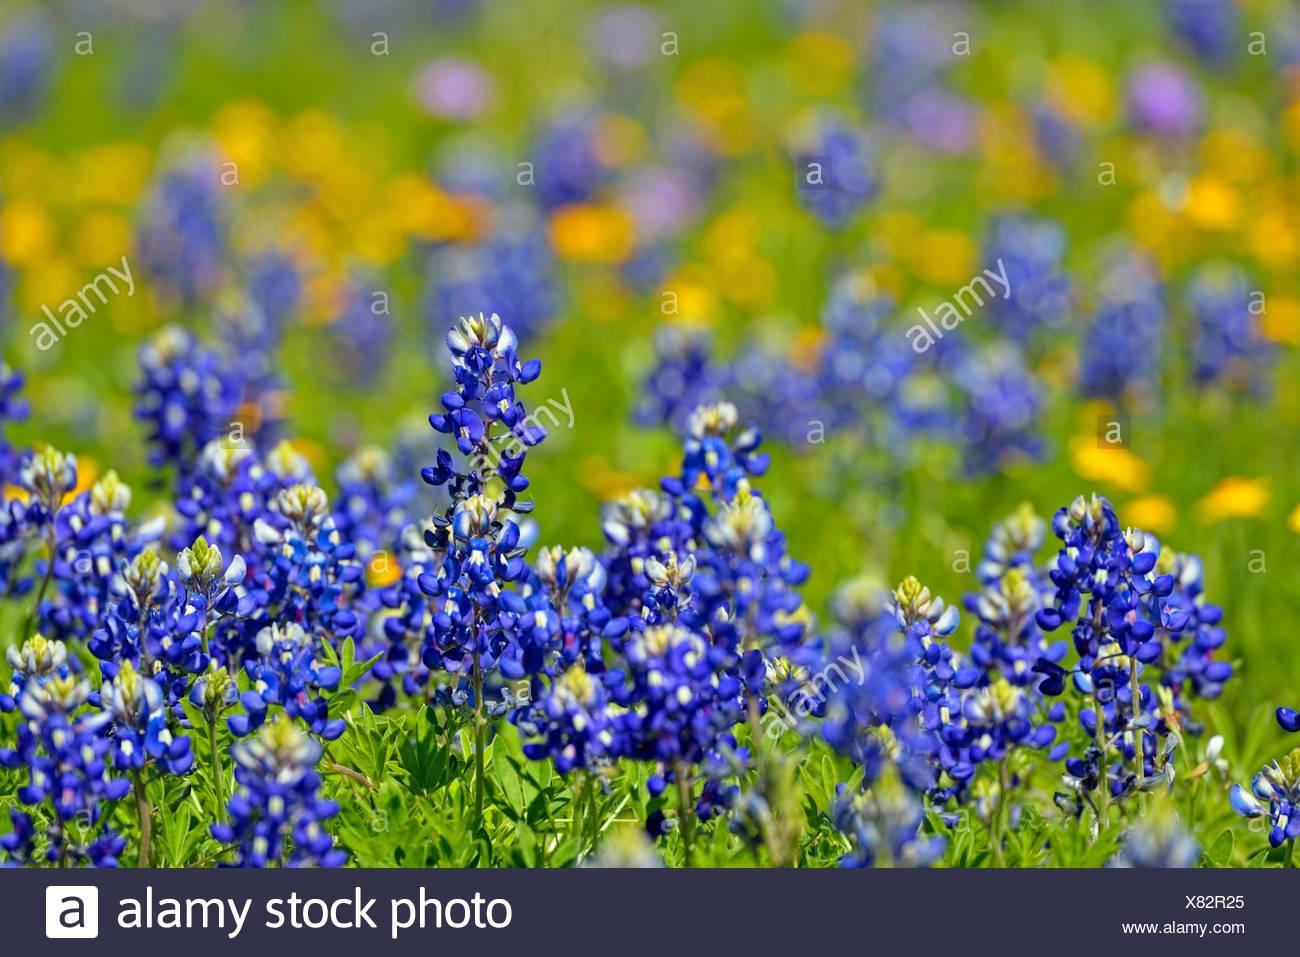 Bluebonnet New Braunfels >> Texas Bluebonnet Lupinus Texensis New Braunfels Texas Usa Stock